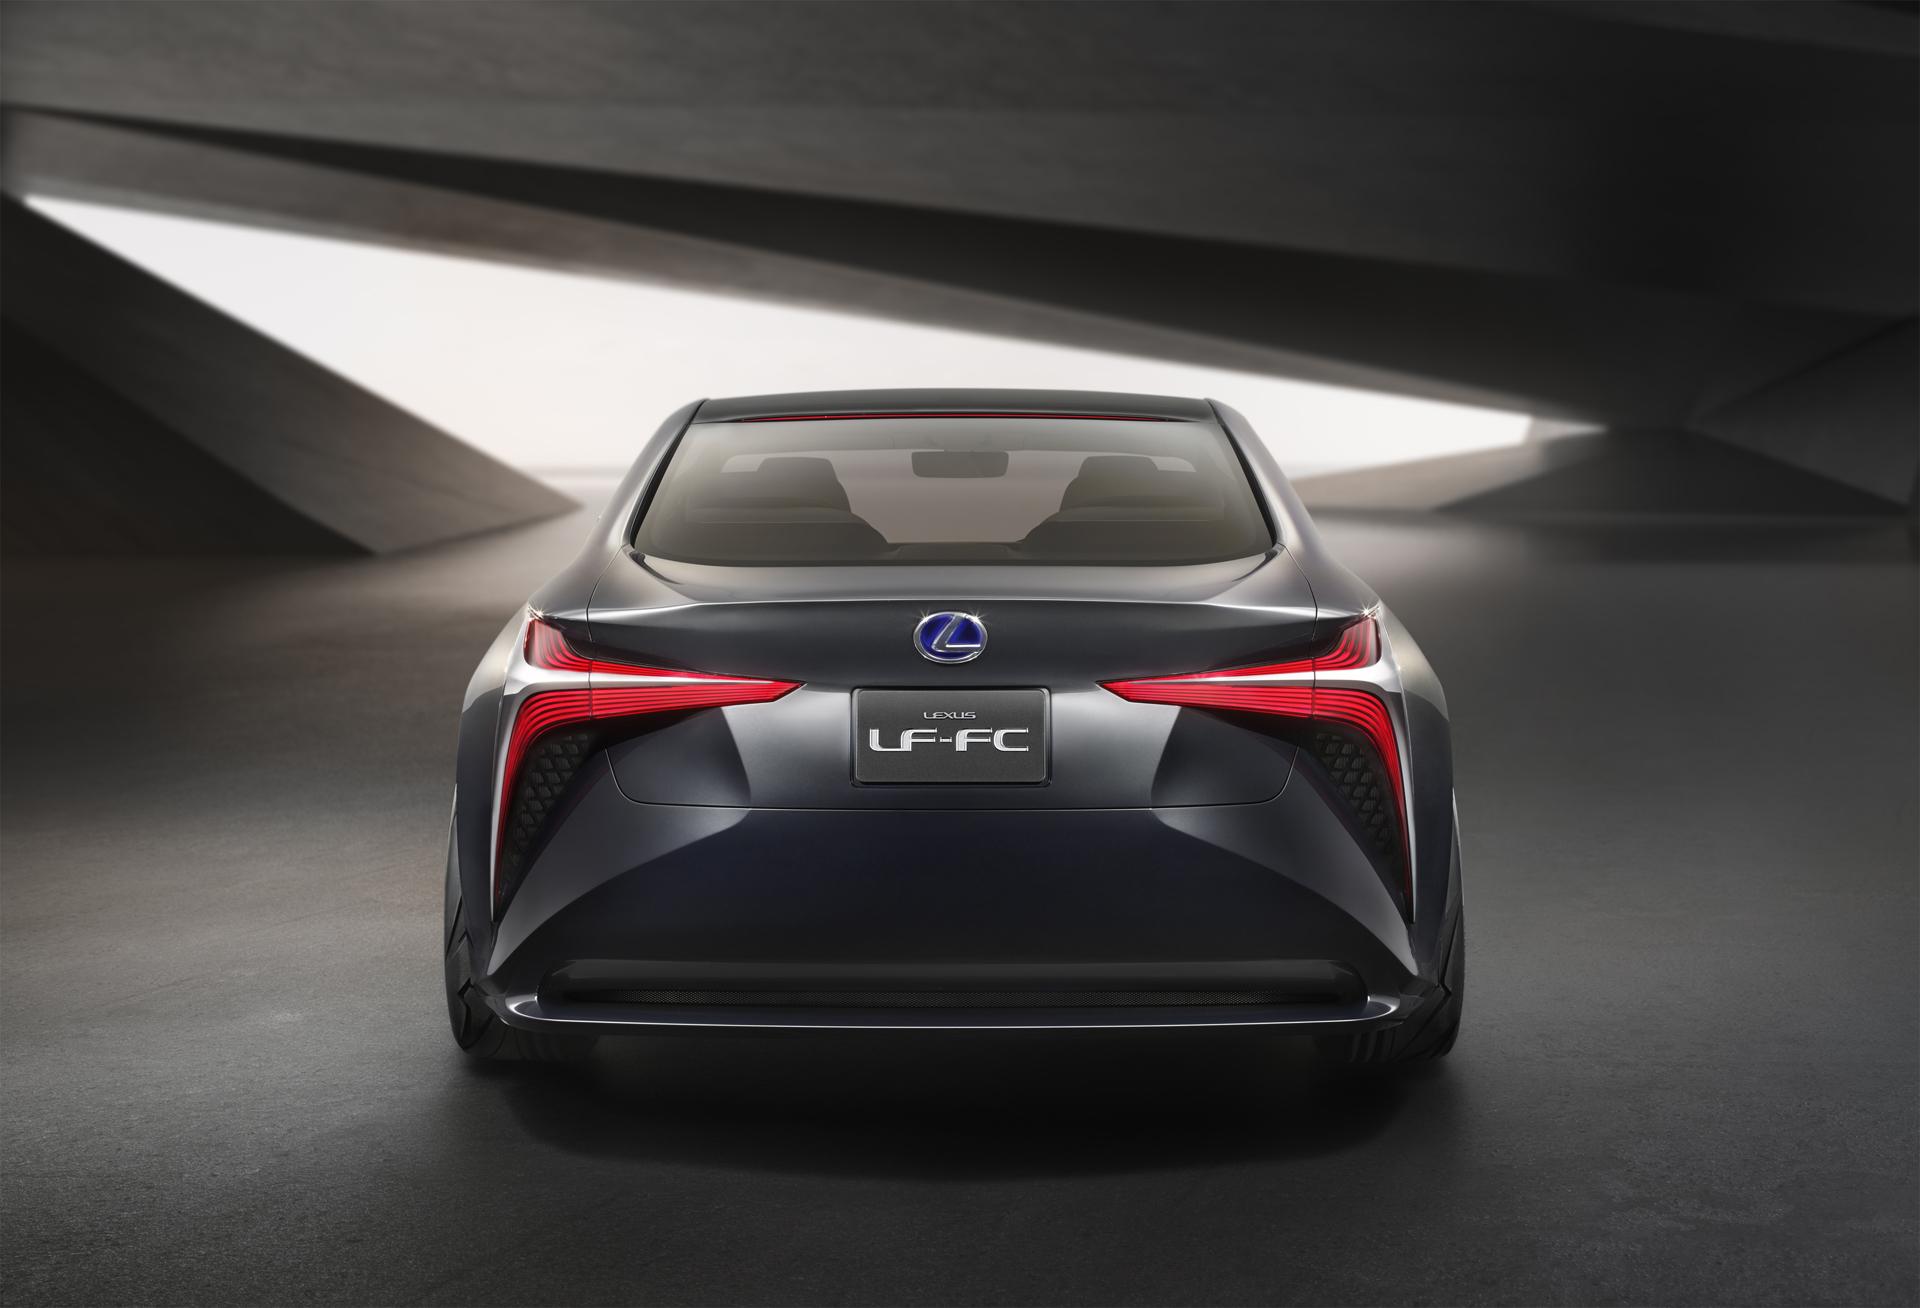 Lexus_LF_FC_Concept_3